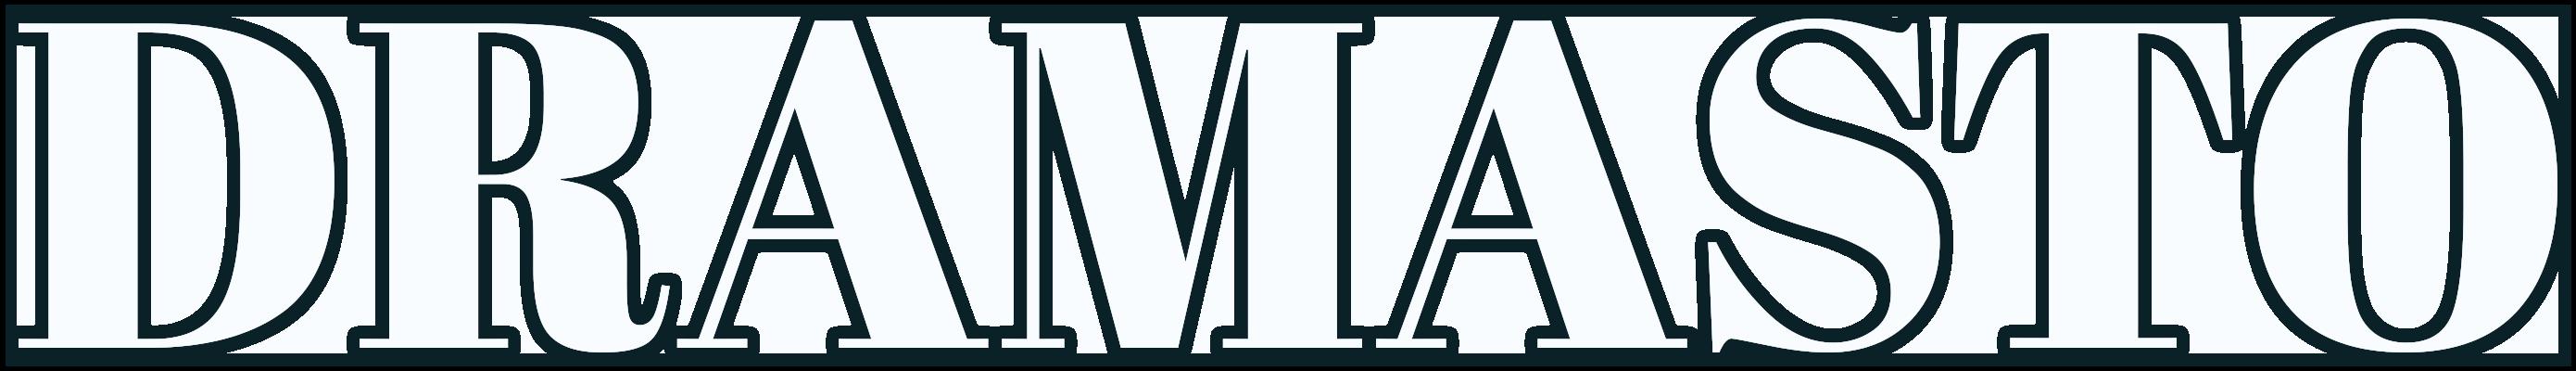 Dramasto logo